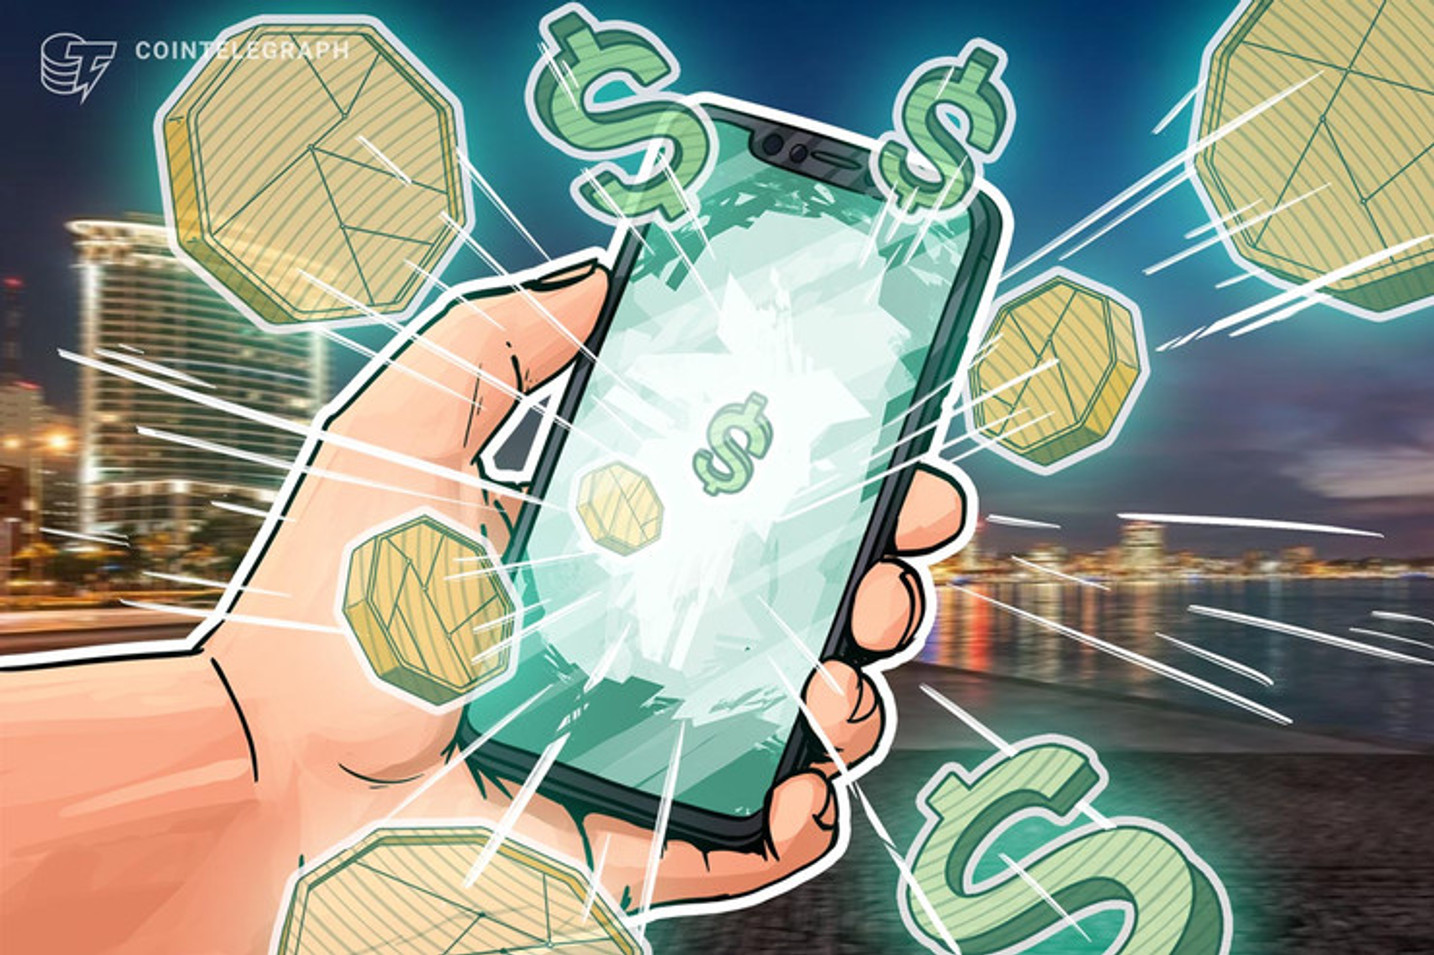 Usuarios de Claro Brasil podrán recargar saldo a sus teléfonos celulares utilizando criptomonedas 'minadas en la nube'